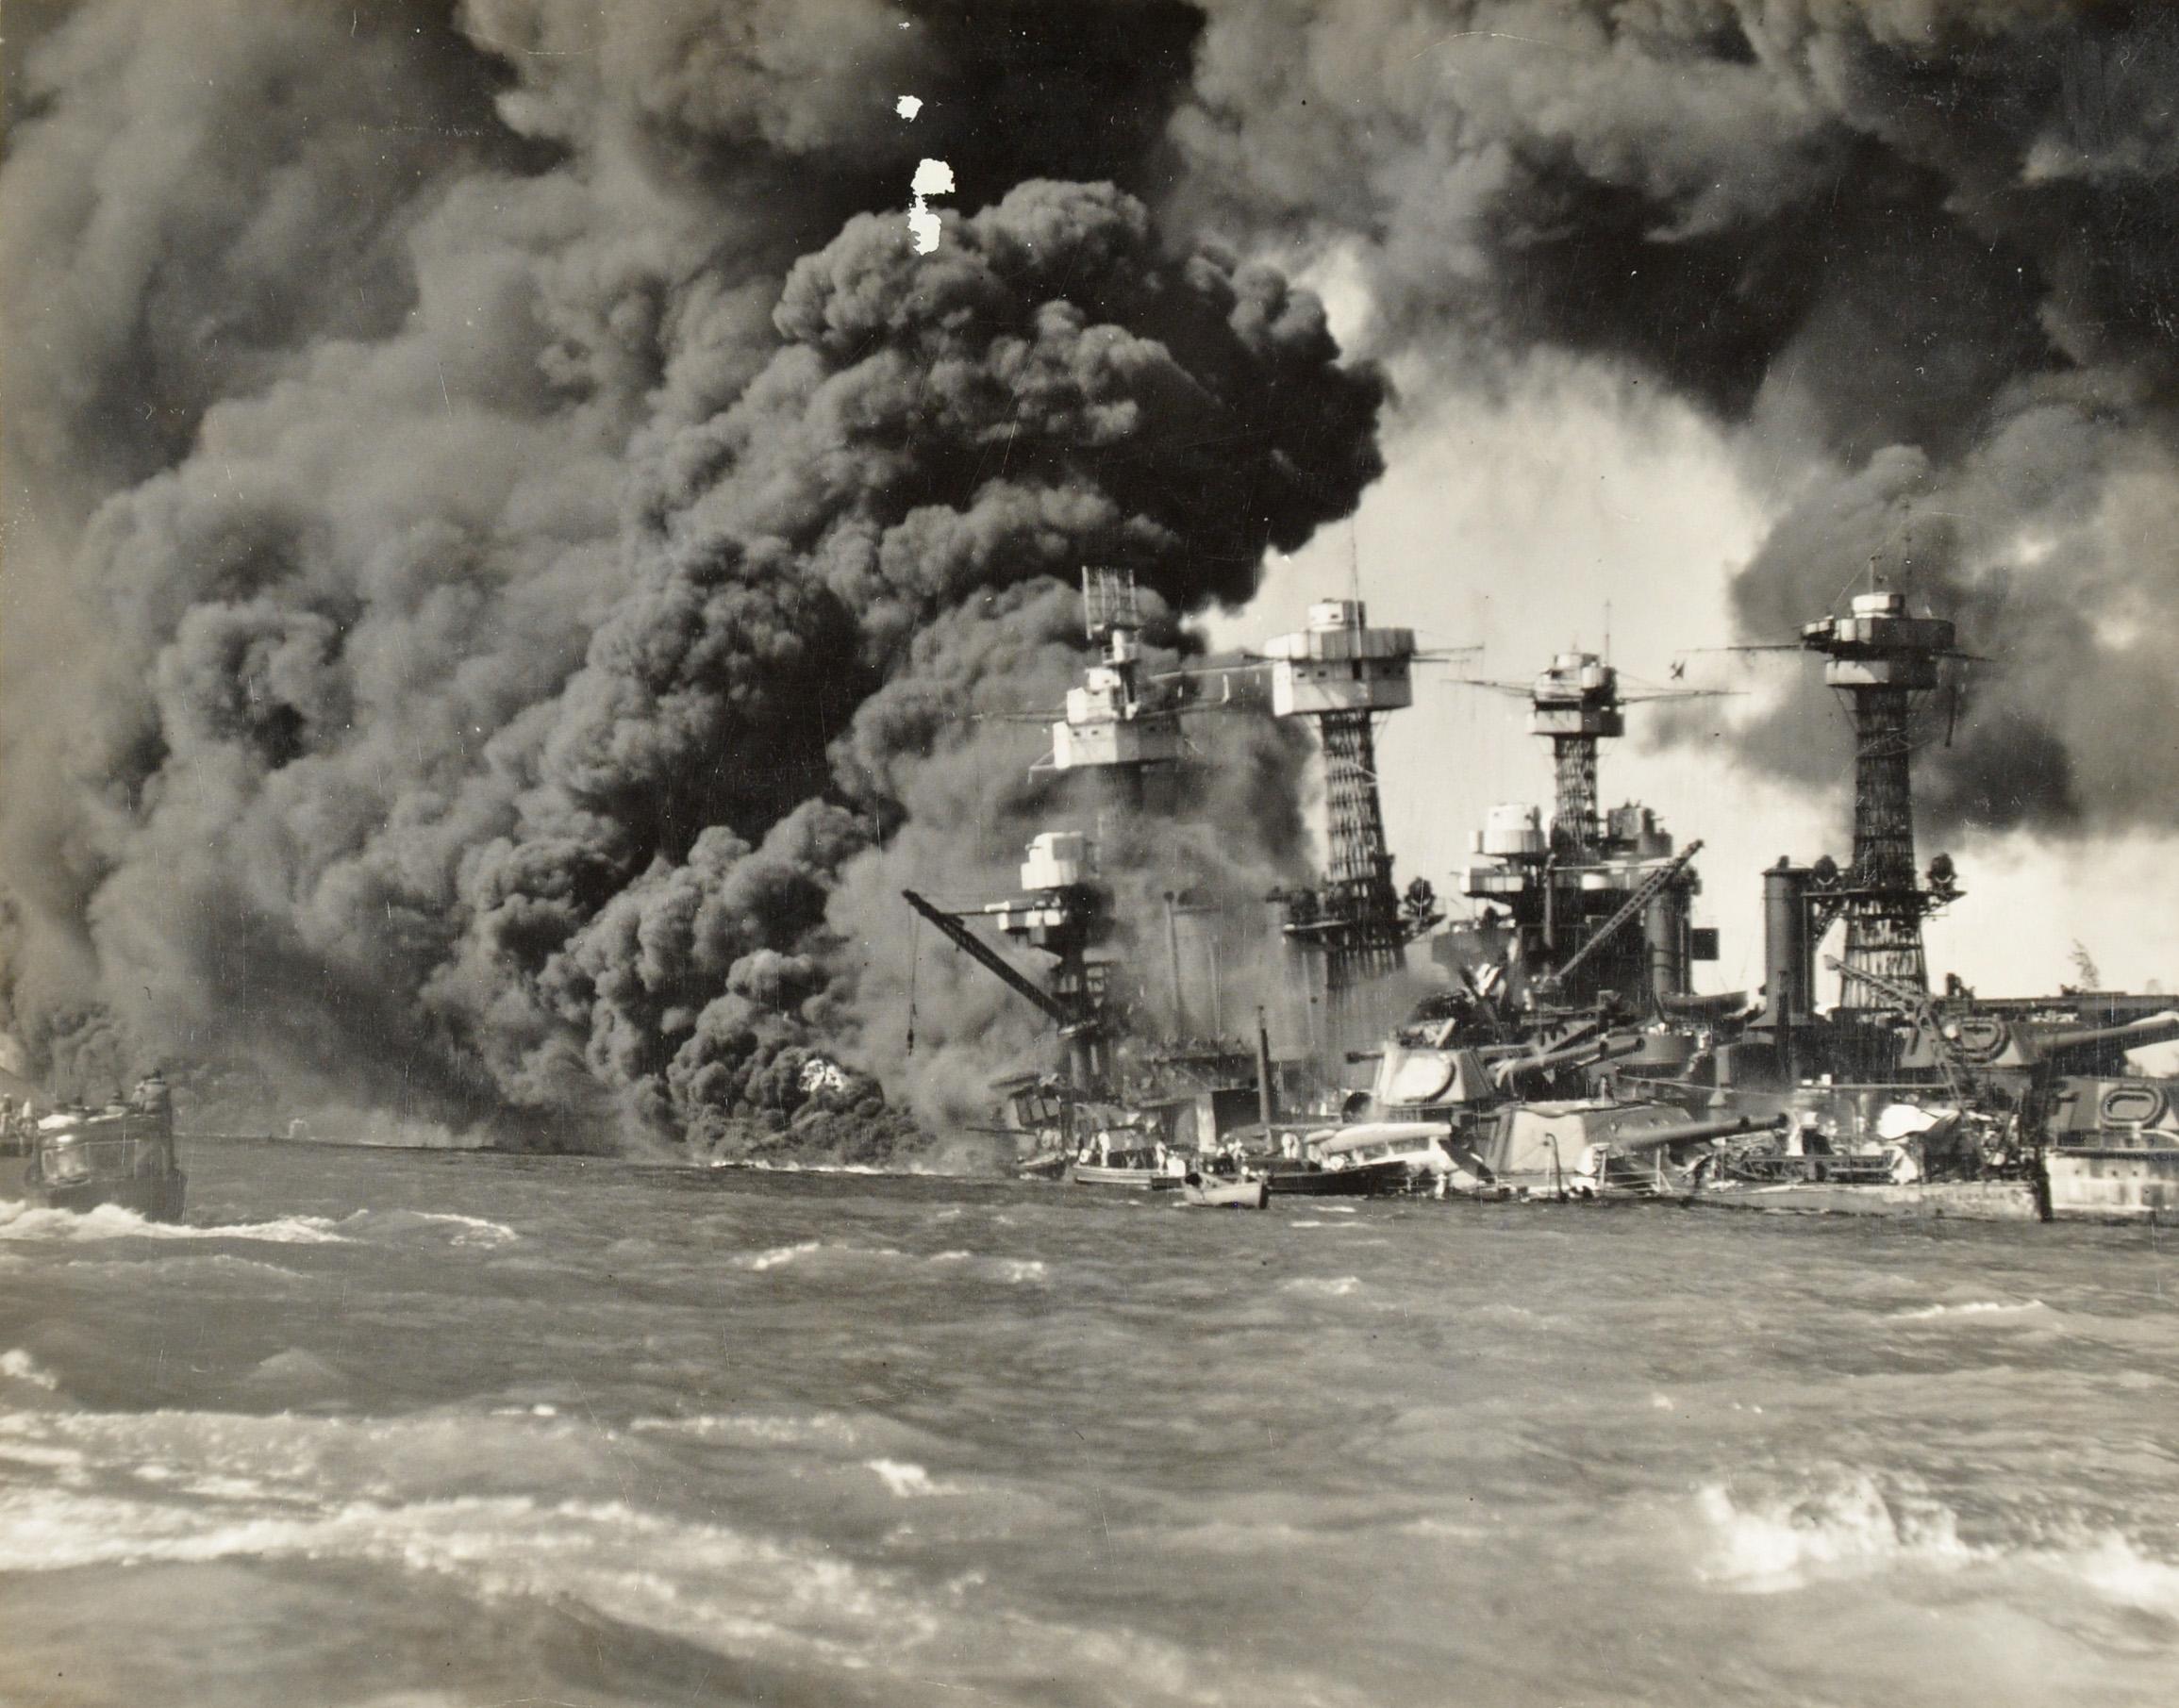 Actual photos of pearl harbor attack